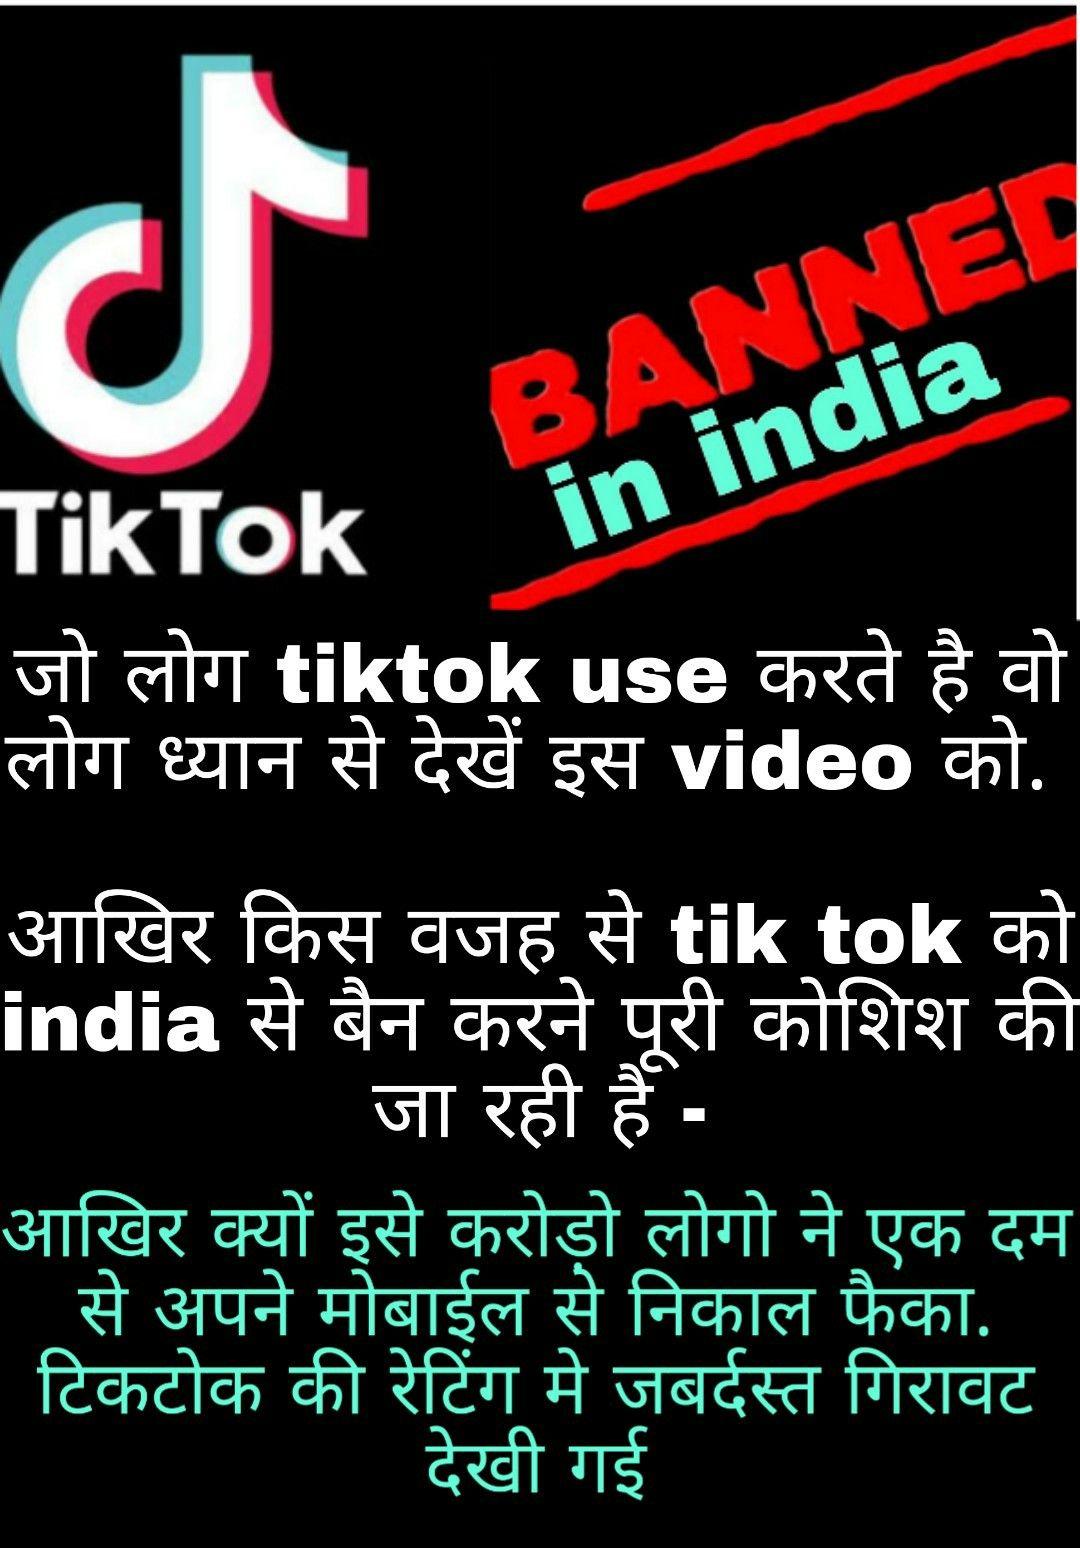 Tik Tok Ban In India In 2020 Moral Stories Social Media Platforms Knowledge